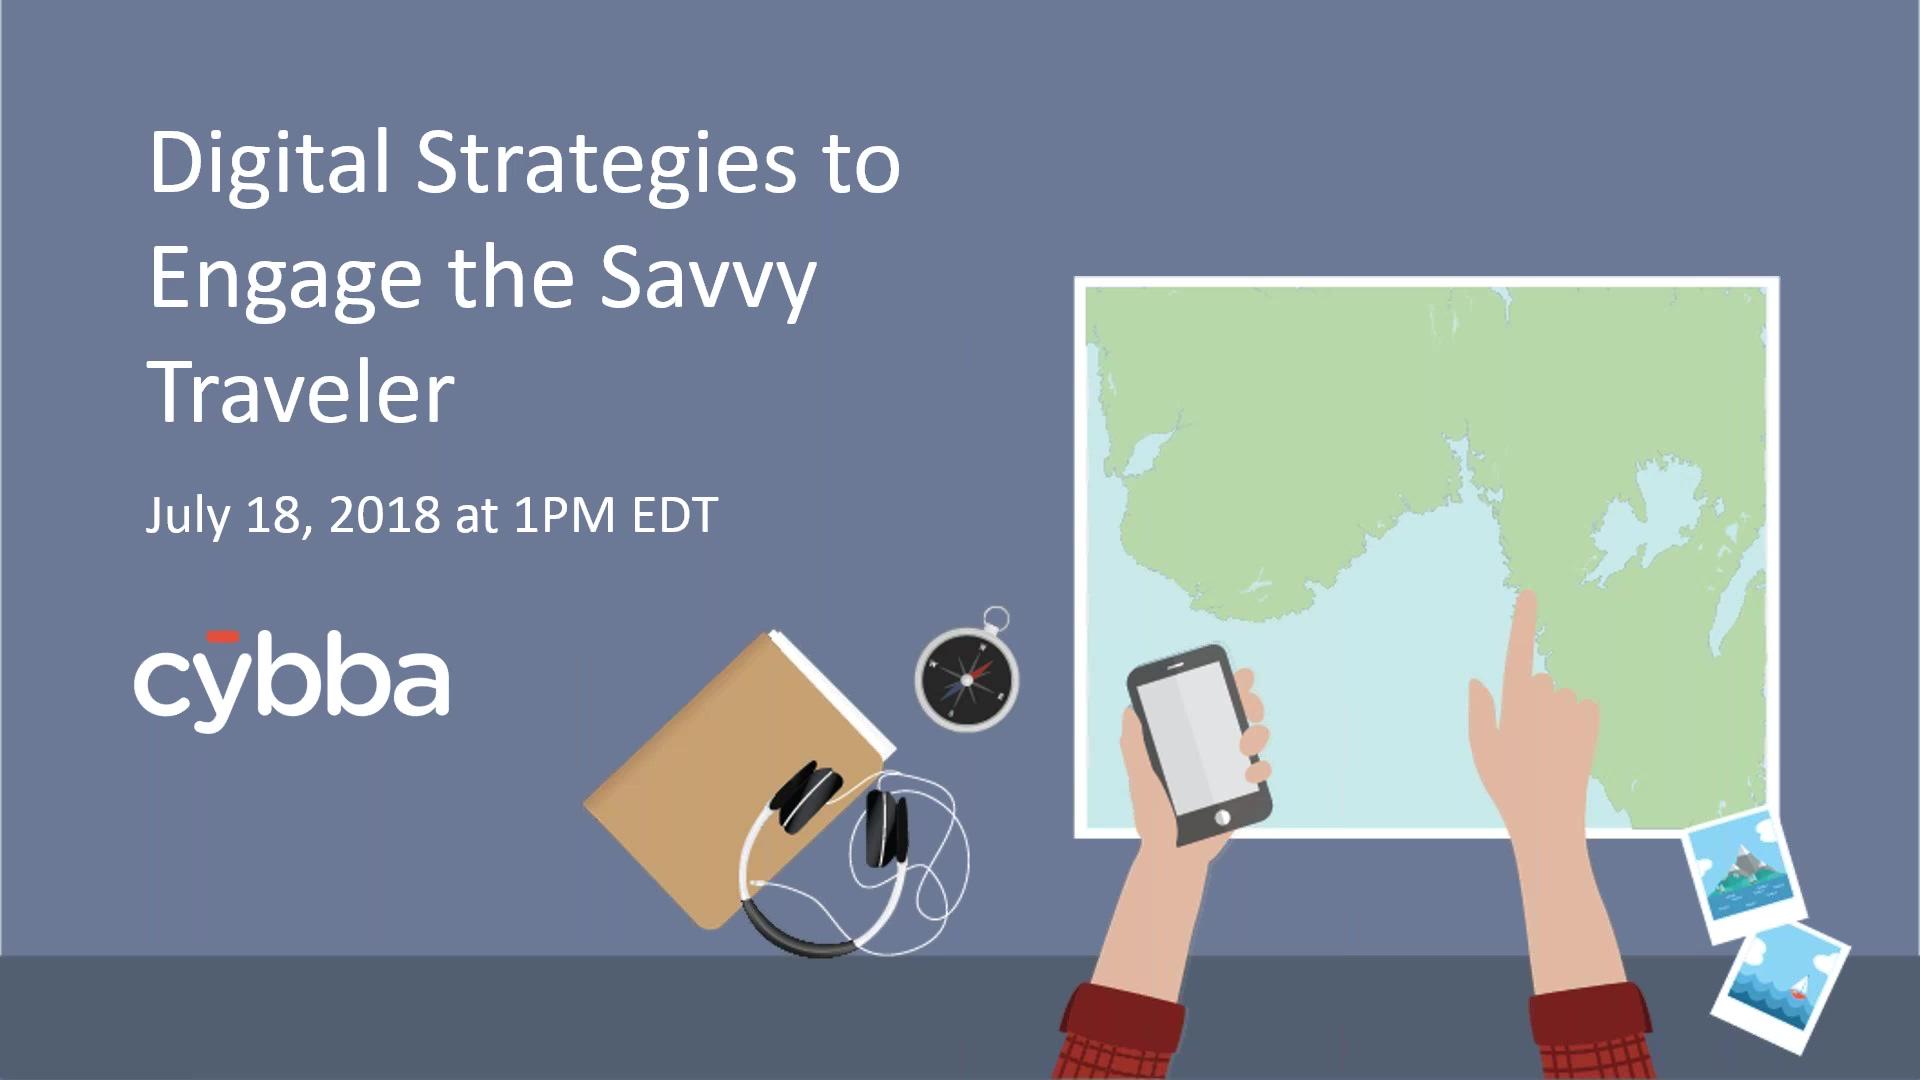 Digital Strategies to Engage the Savvy Traveler